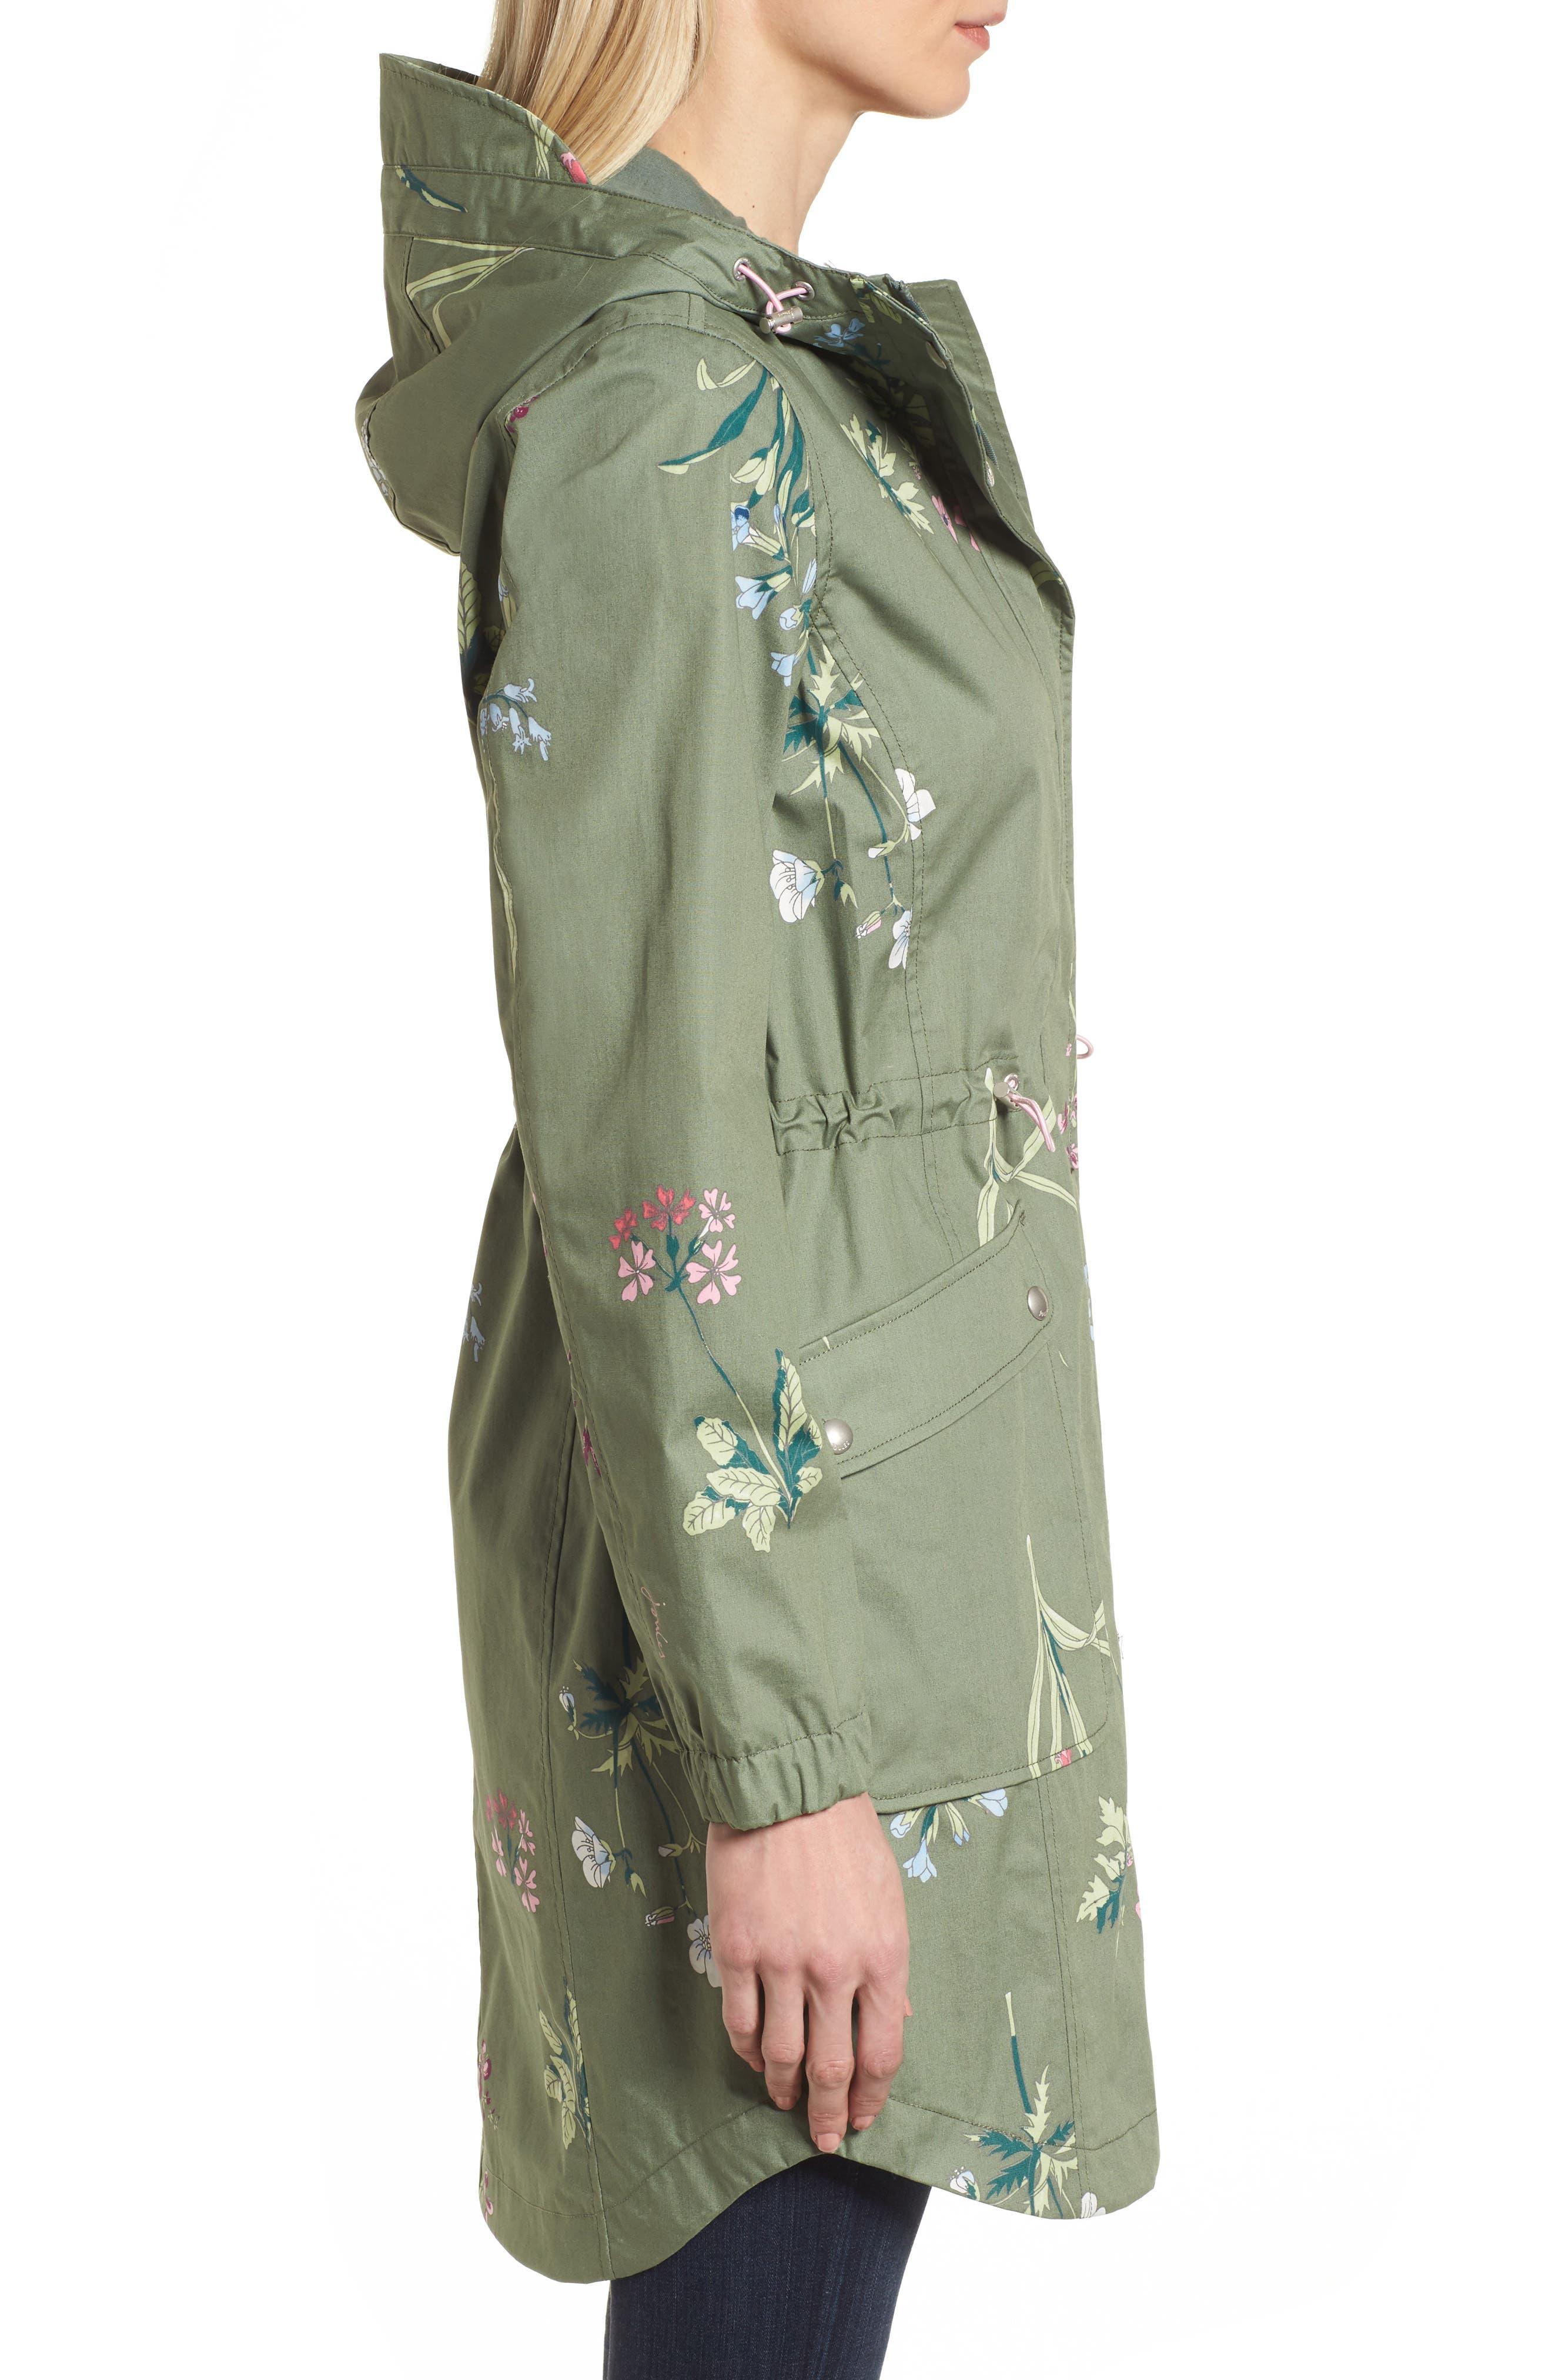 Right as Rain - Coastline Waterproof Cotton Jacket,                             Alternate thumbnail 3, color,